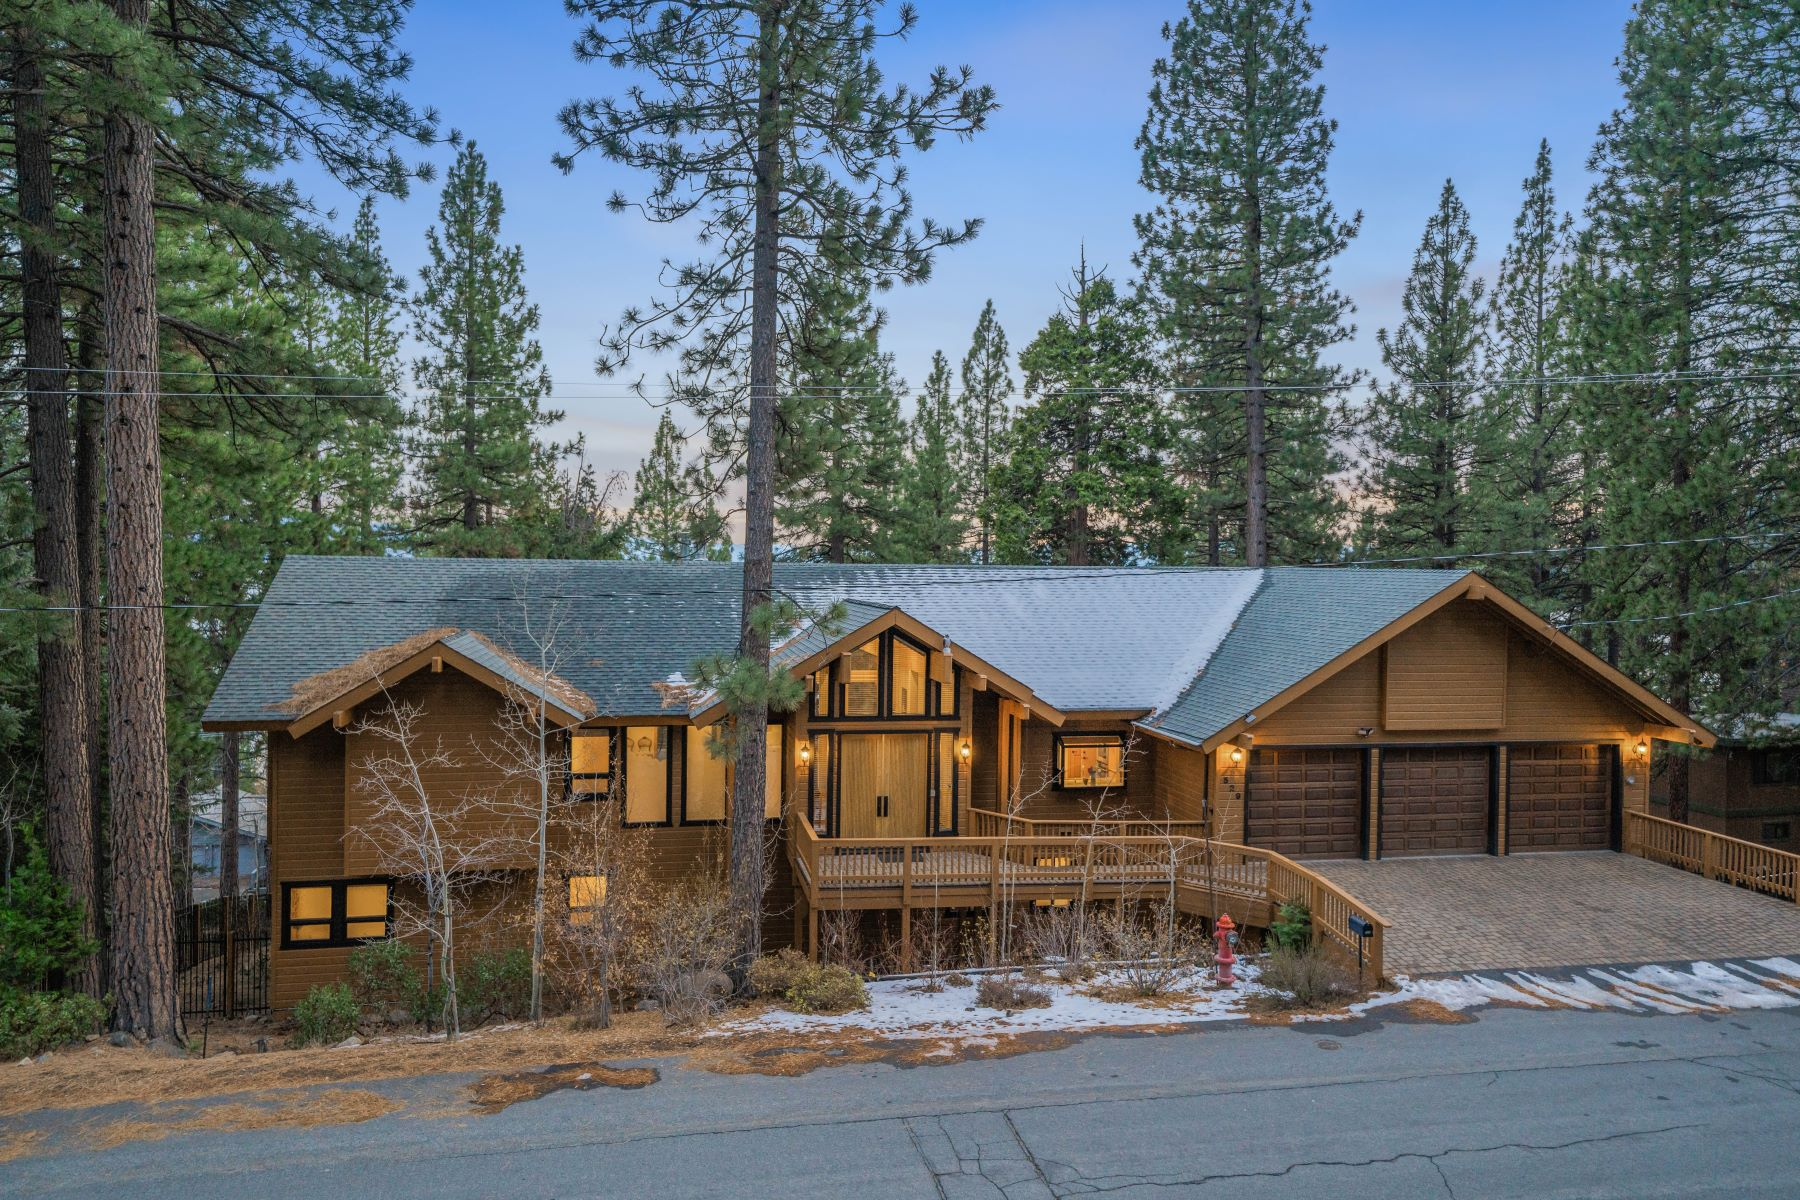 Property for Active at Ponderosa Paradise 529 Ponderosa Ave Incline Village, Nevada 89451 United States